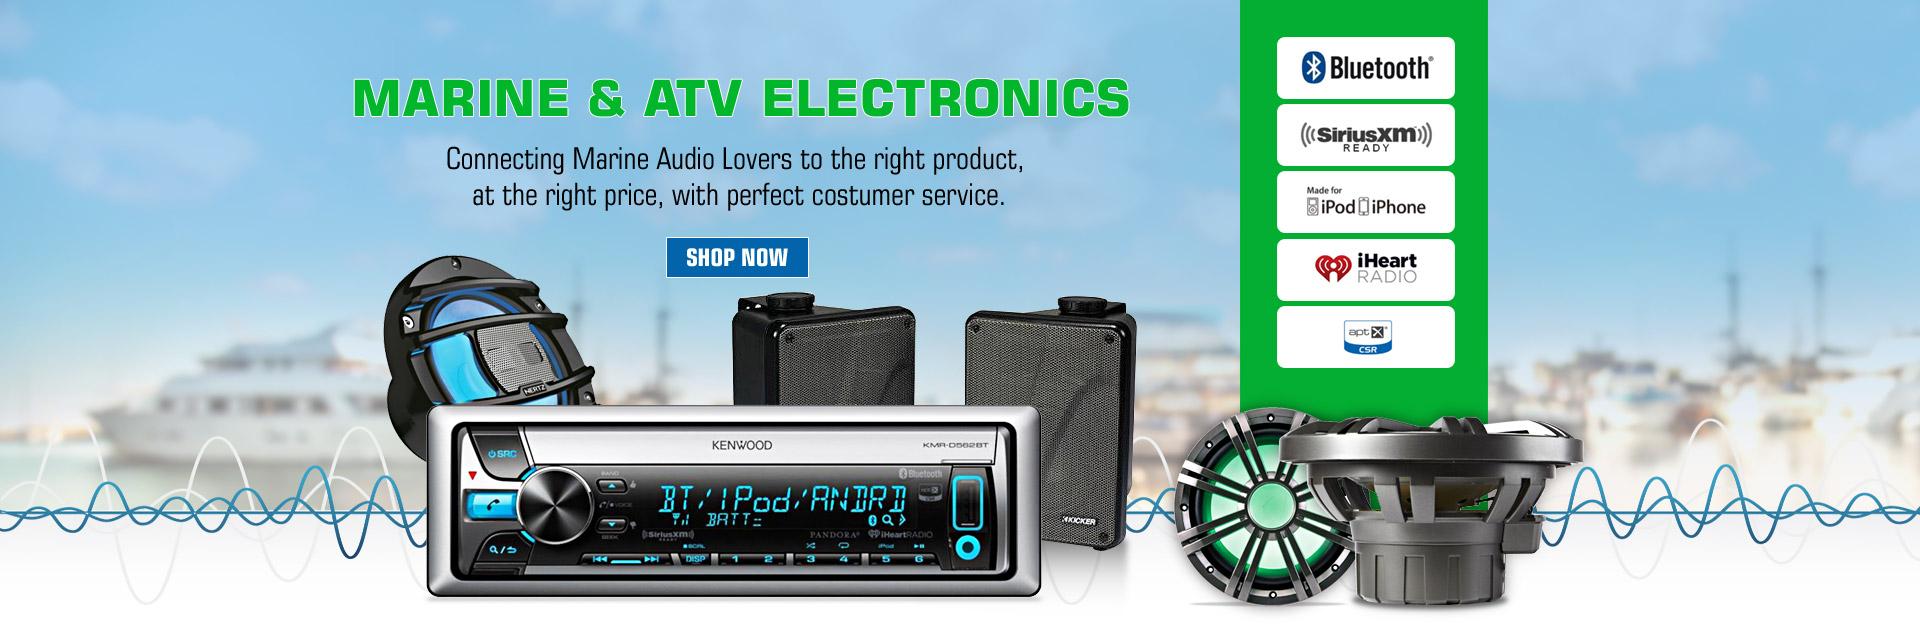 Super Car Boat Video Audio Gear Accessories Road Entertainment Boss Marine Radio Speakers Wiring